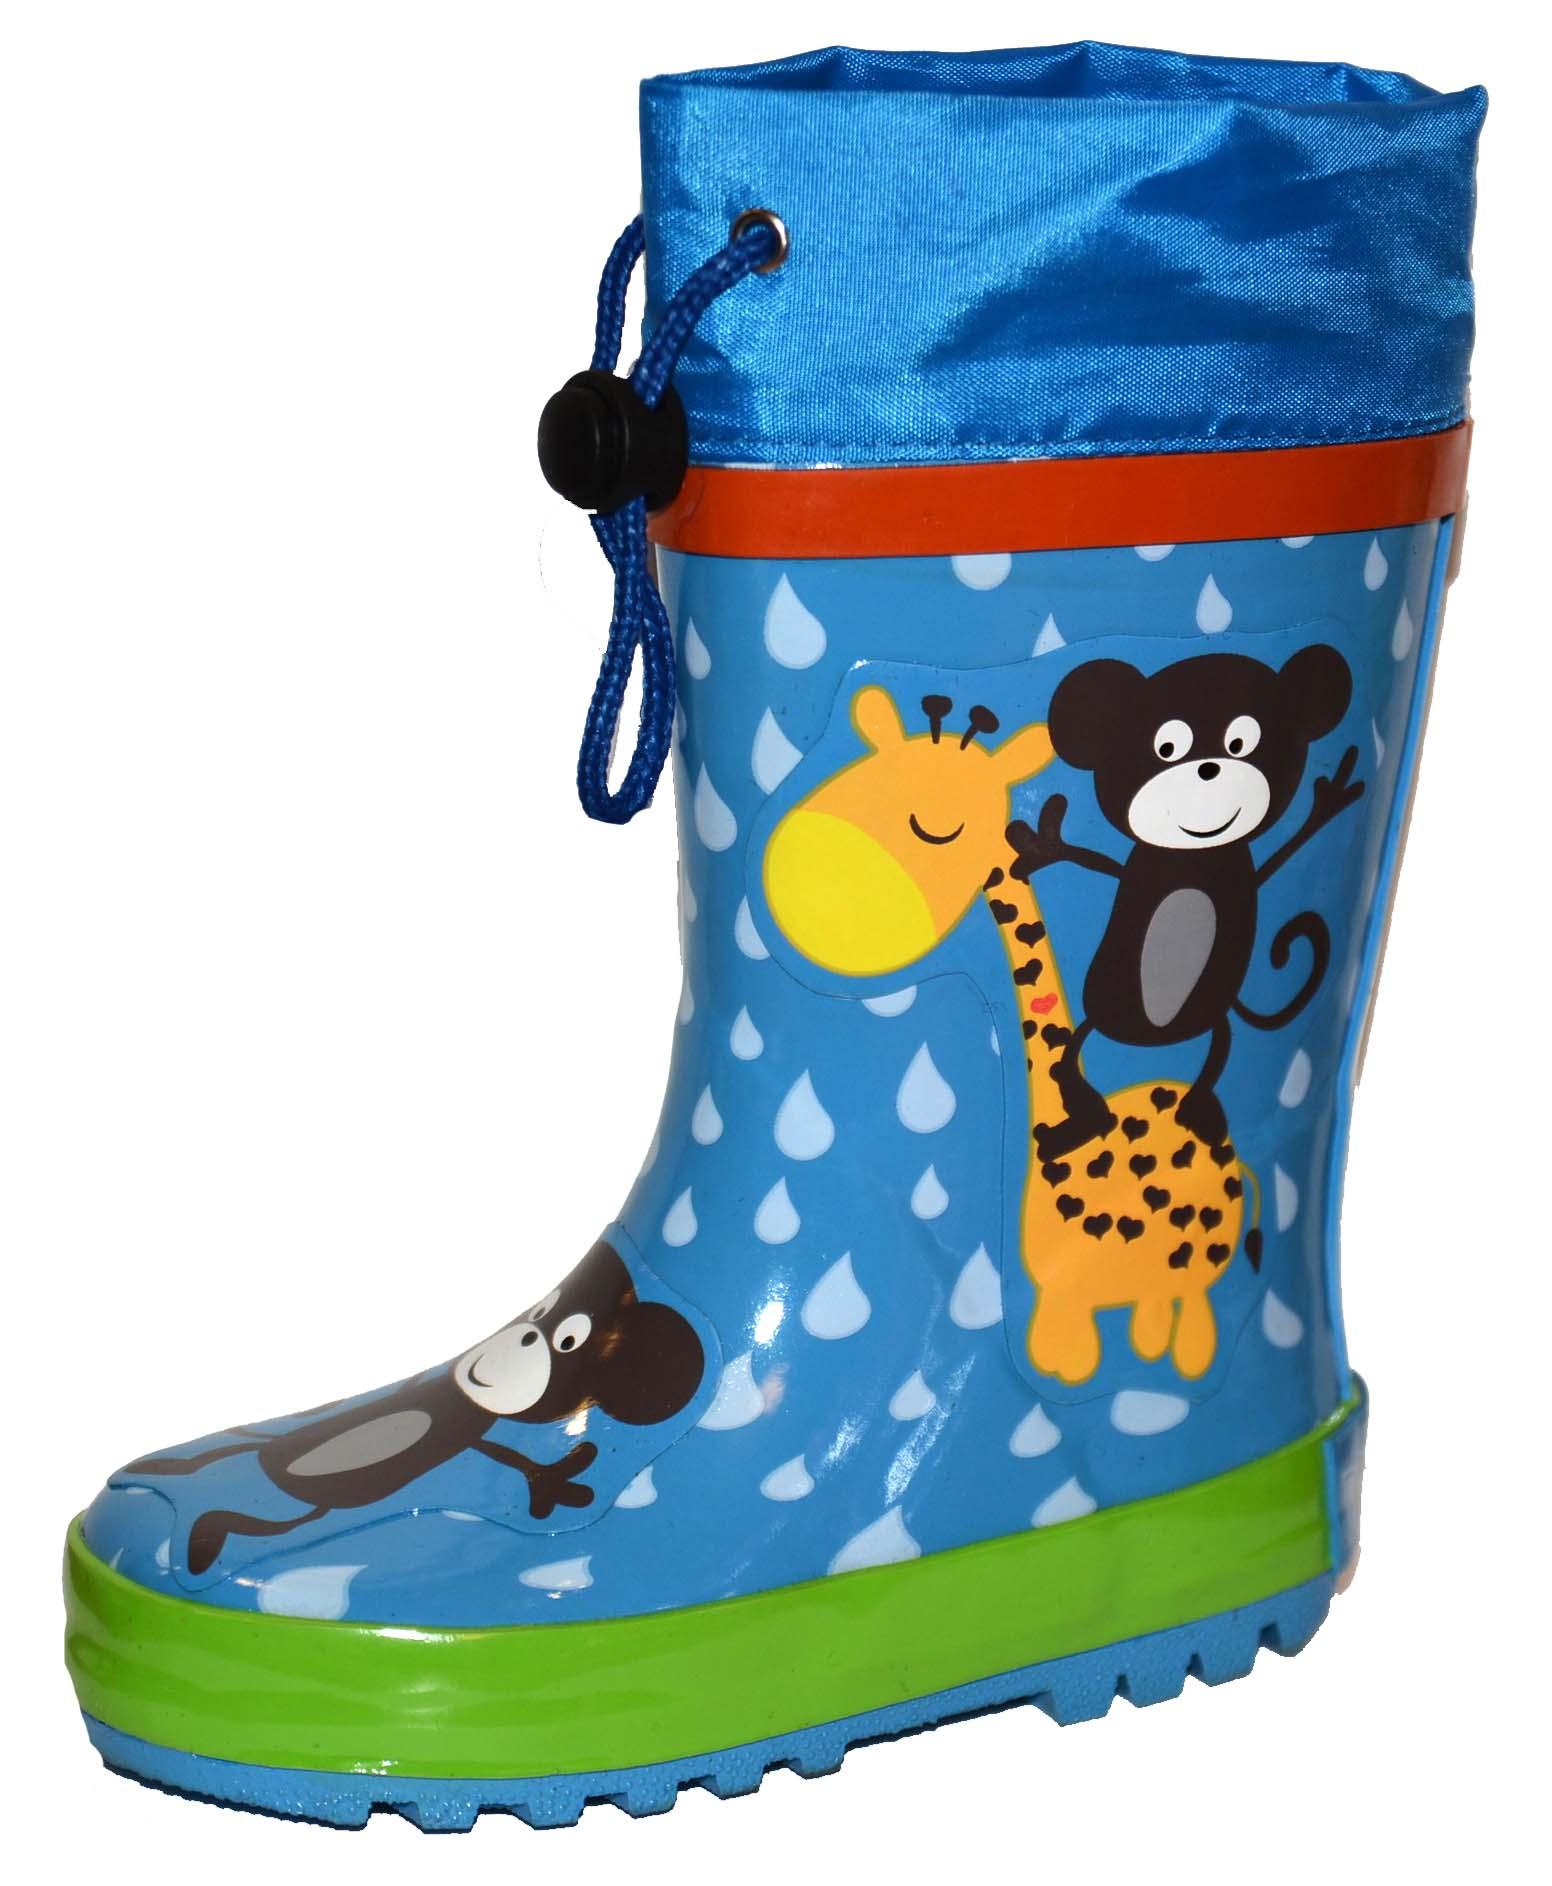 PIDILIDI Detské čižmy s opičkami - modré e94f93725c3